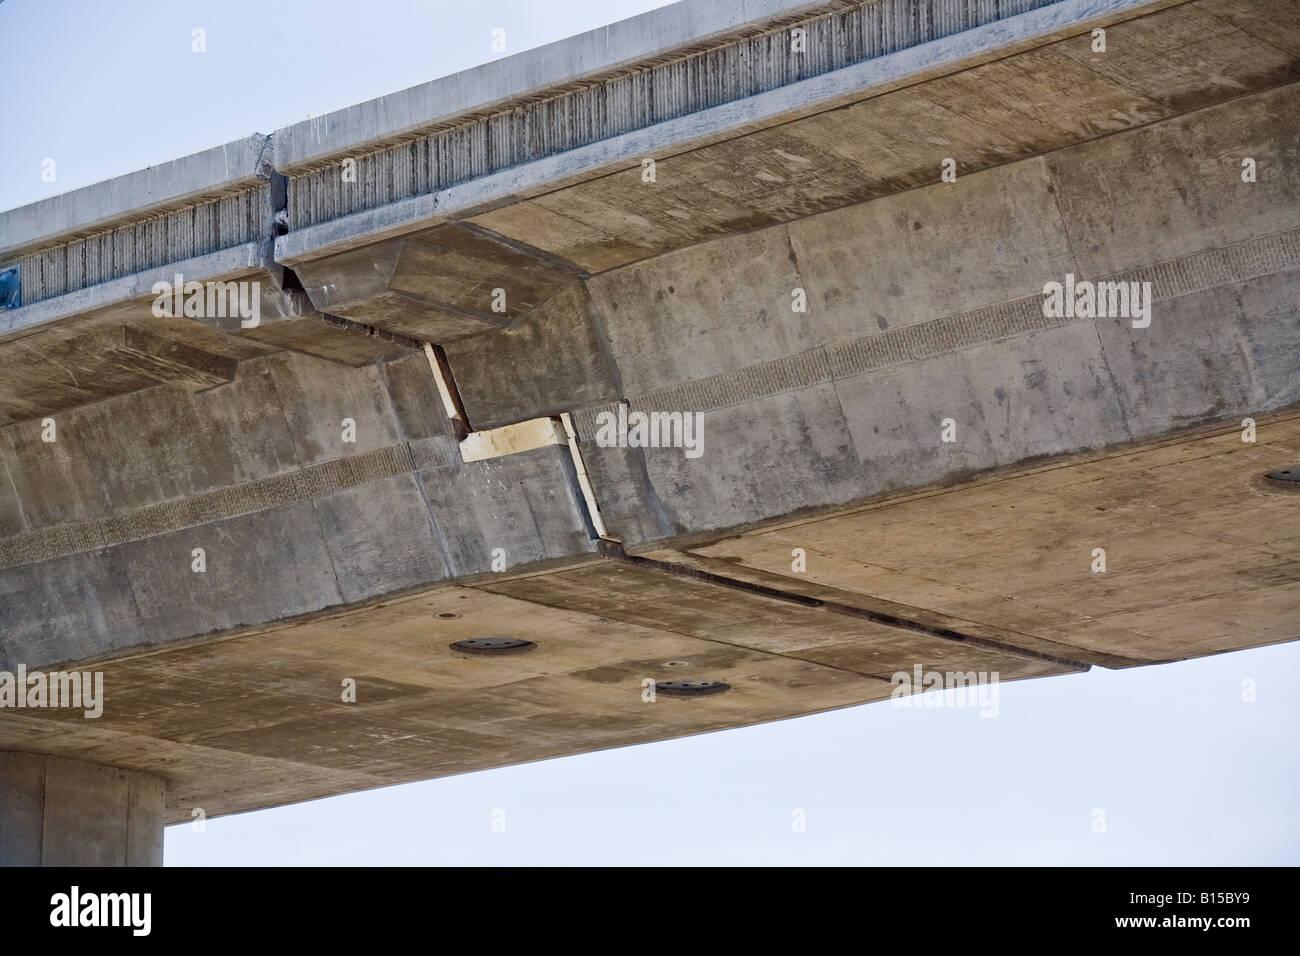 dehnfuge in konkrete obenliegende fahrbahn in südkalifornien